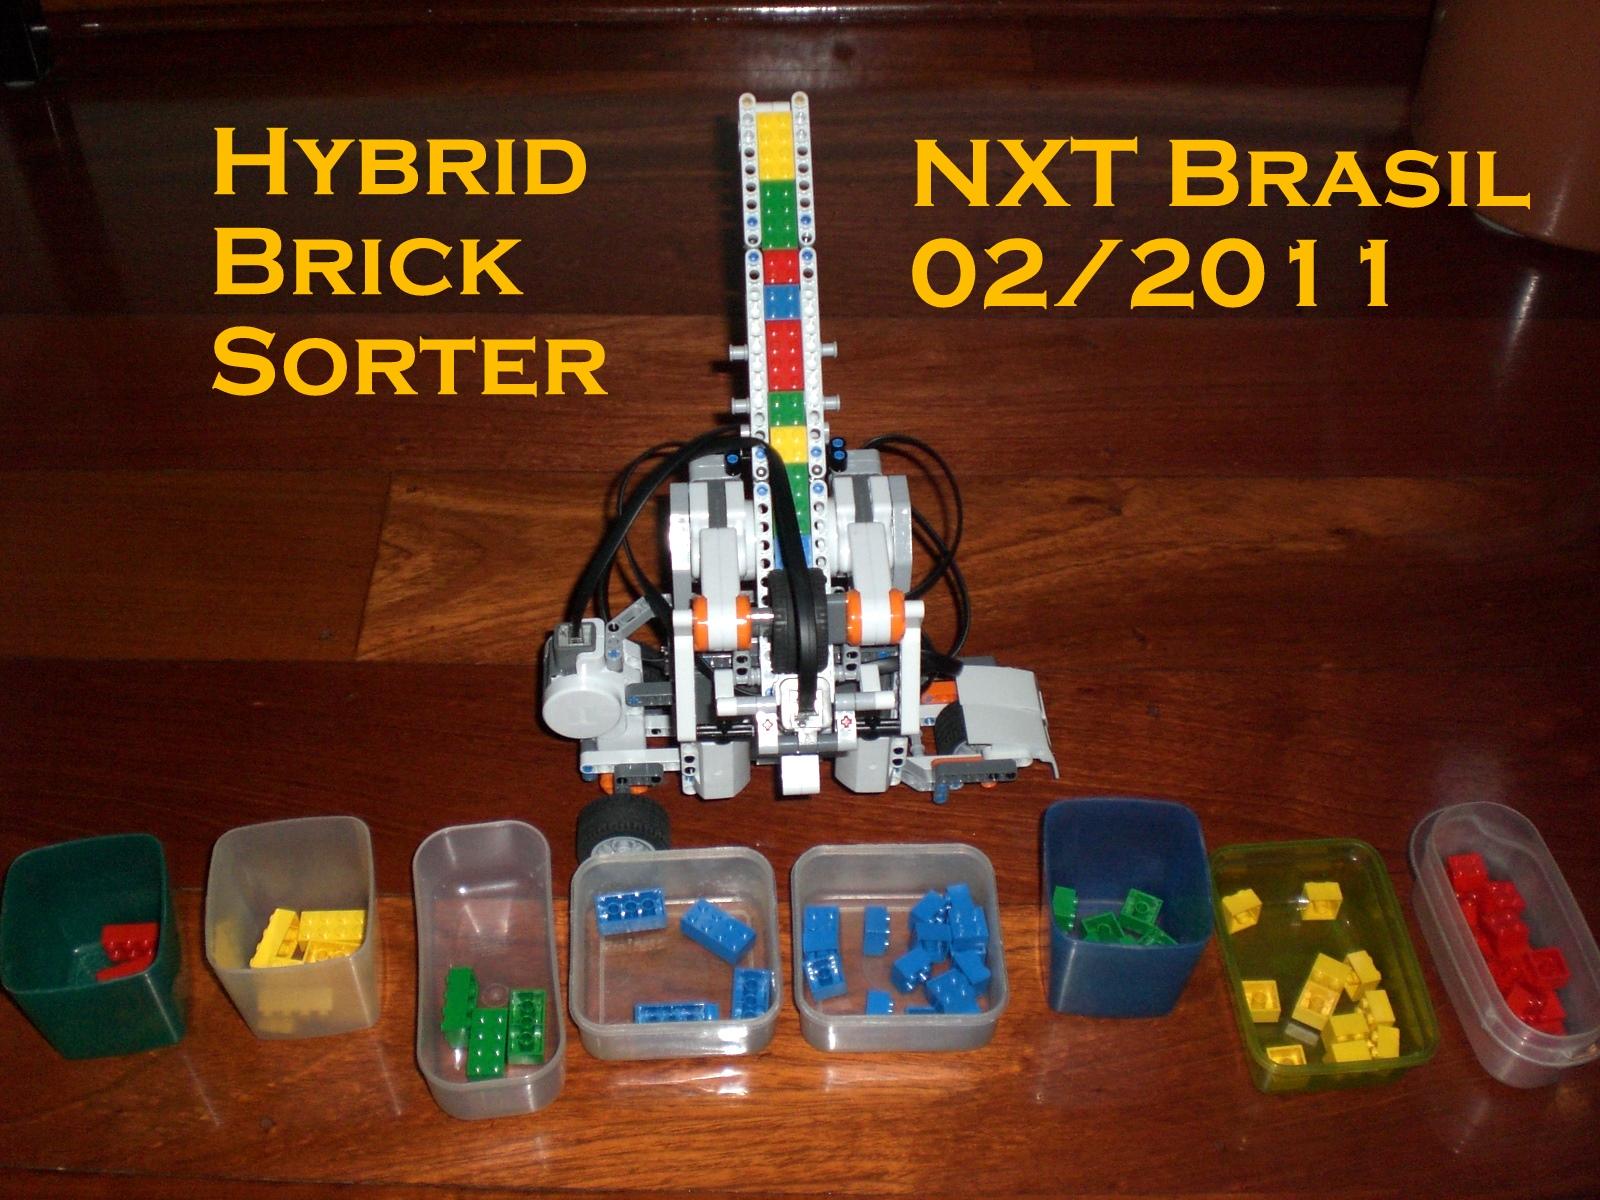 NXT Brazil: Hybrid Brick Sorter